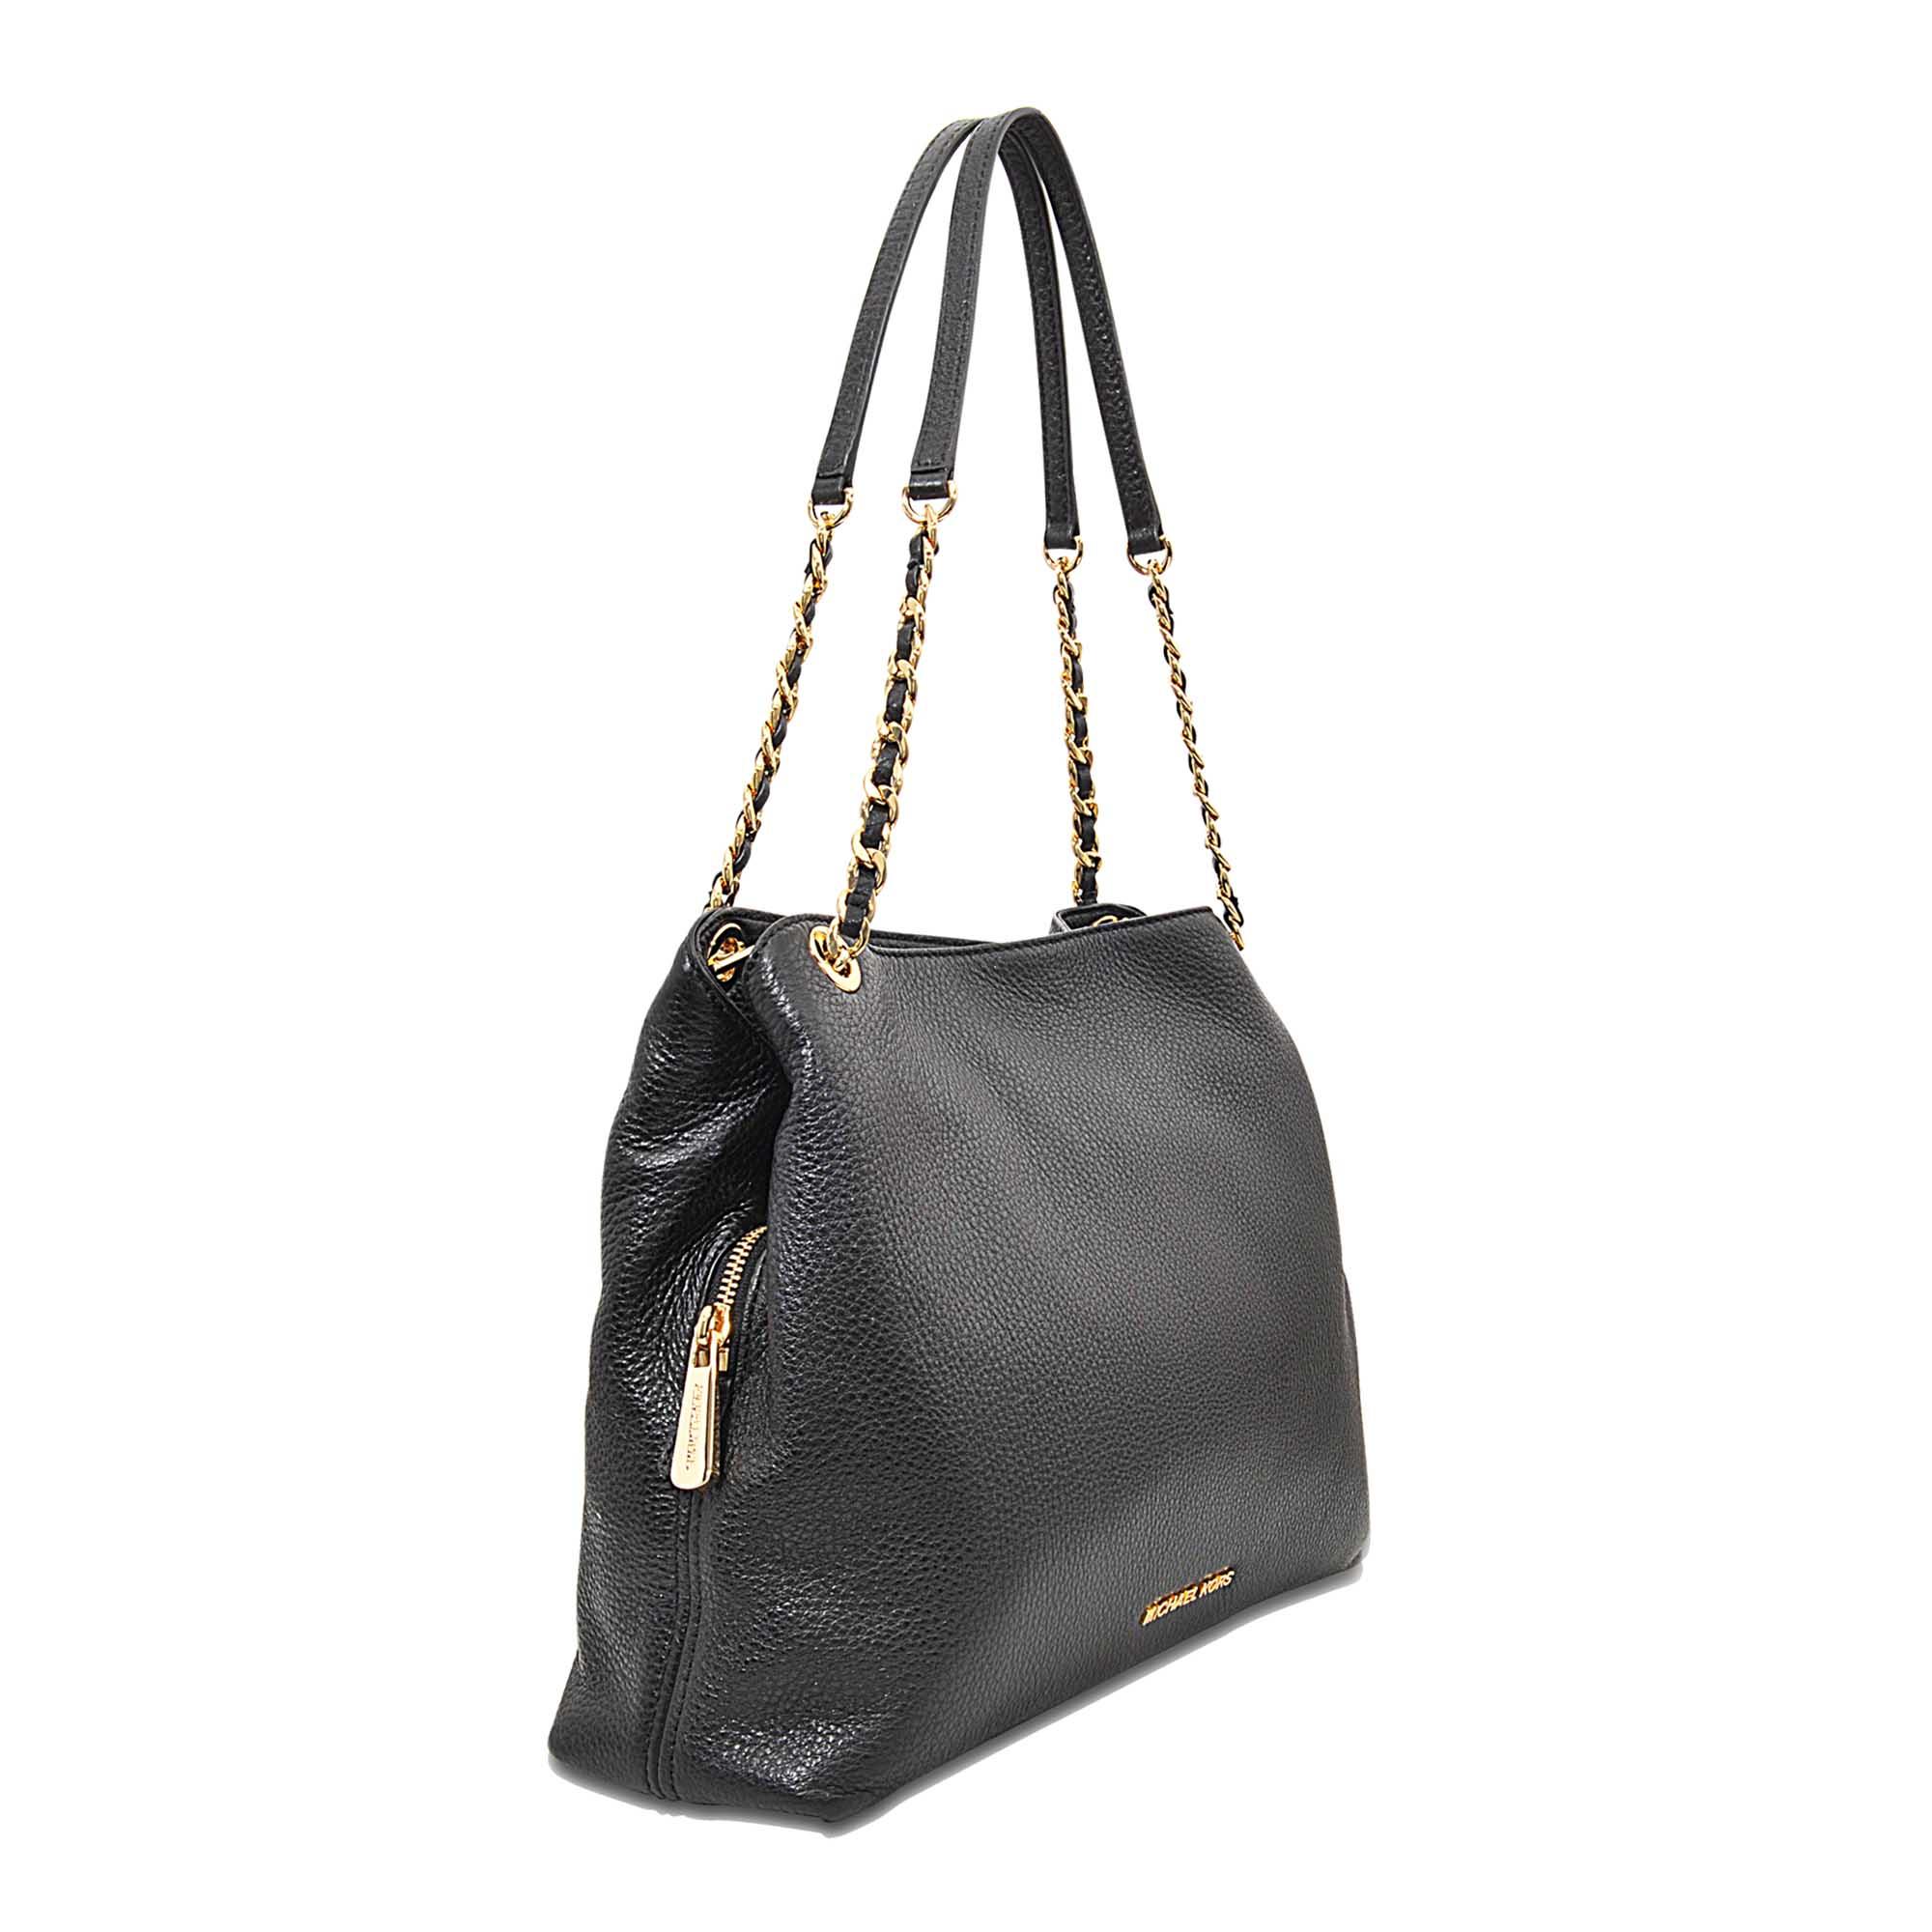 edc11471cd0341 446b3 44210; cheapest lyst michael michael kors jet set chain item lg chain  shoulder bag 760e3 6abc0